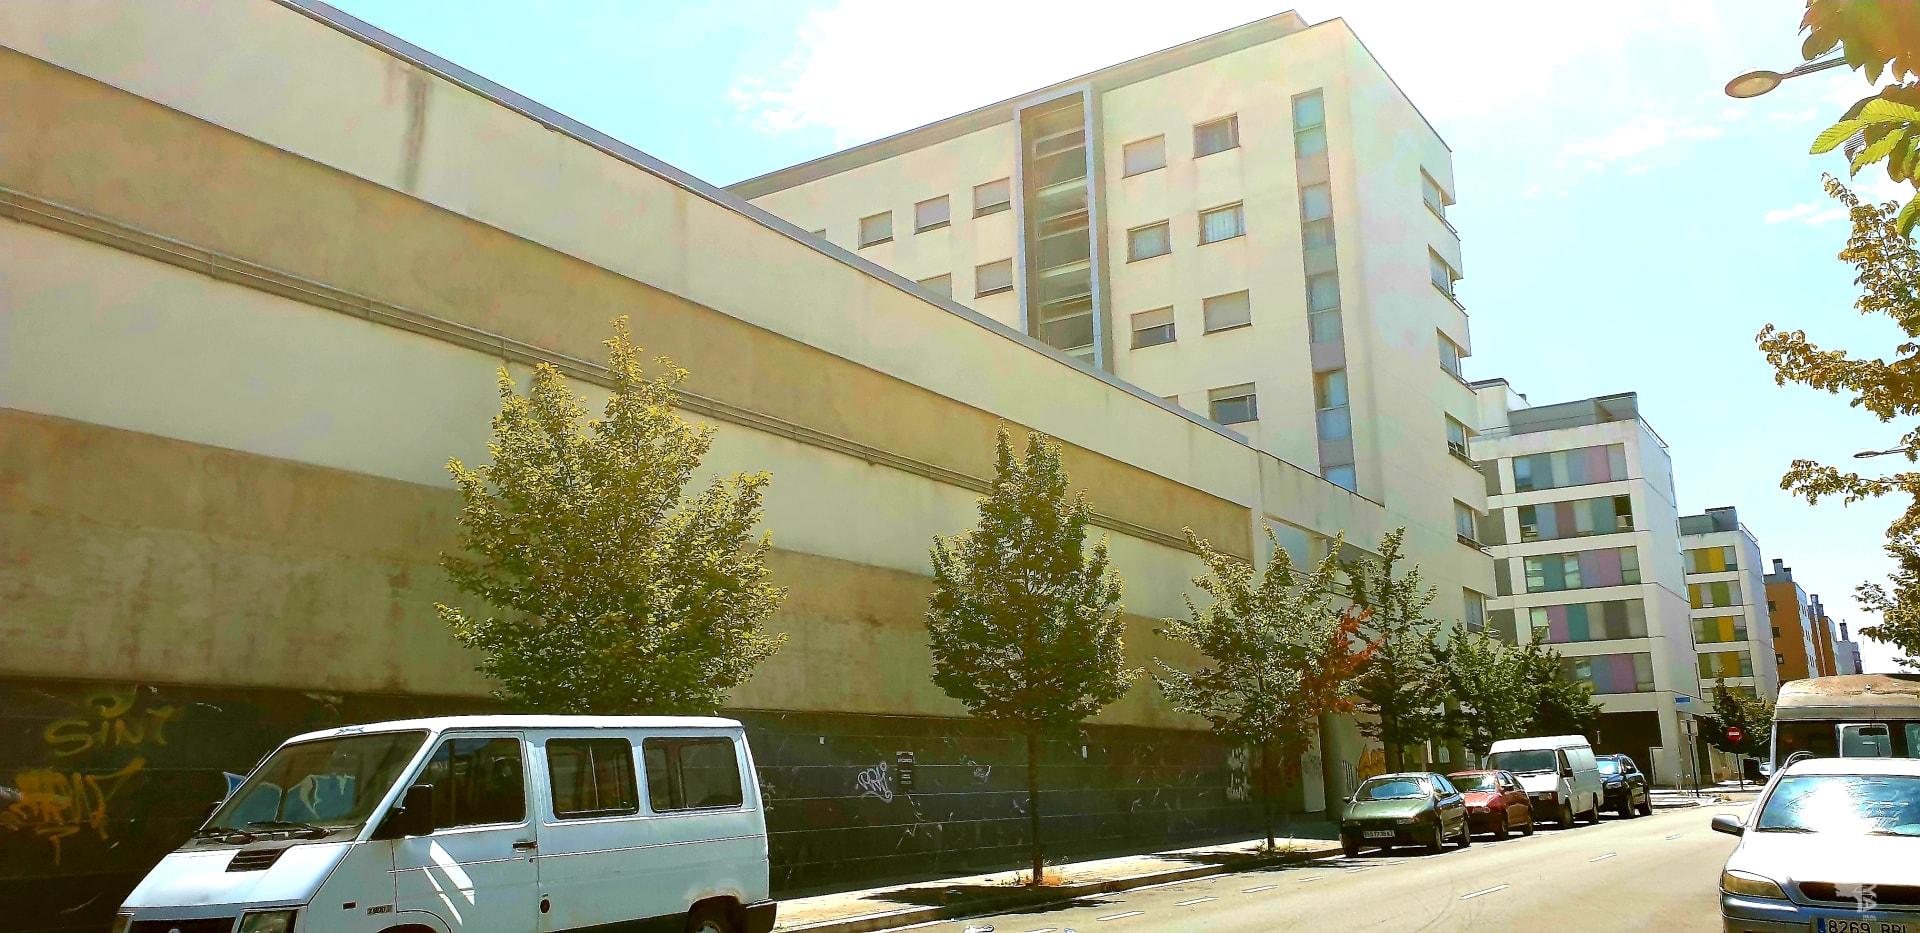 Parking en venta en Salburua, Vitoria-gasteiz, Álava, Calle Viena, 5.500 €, 27 m2